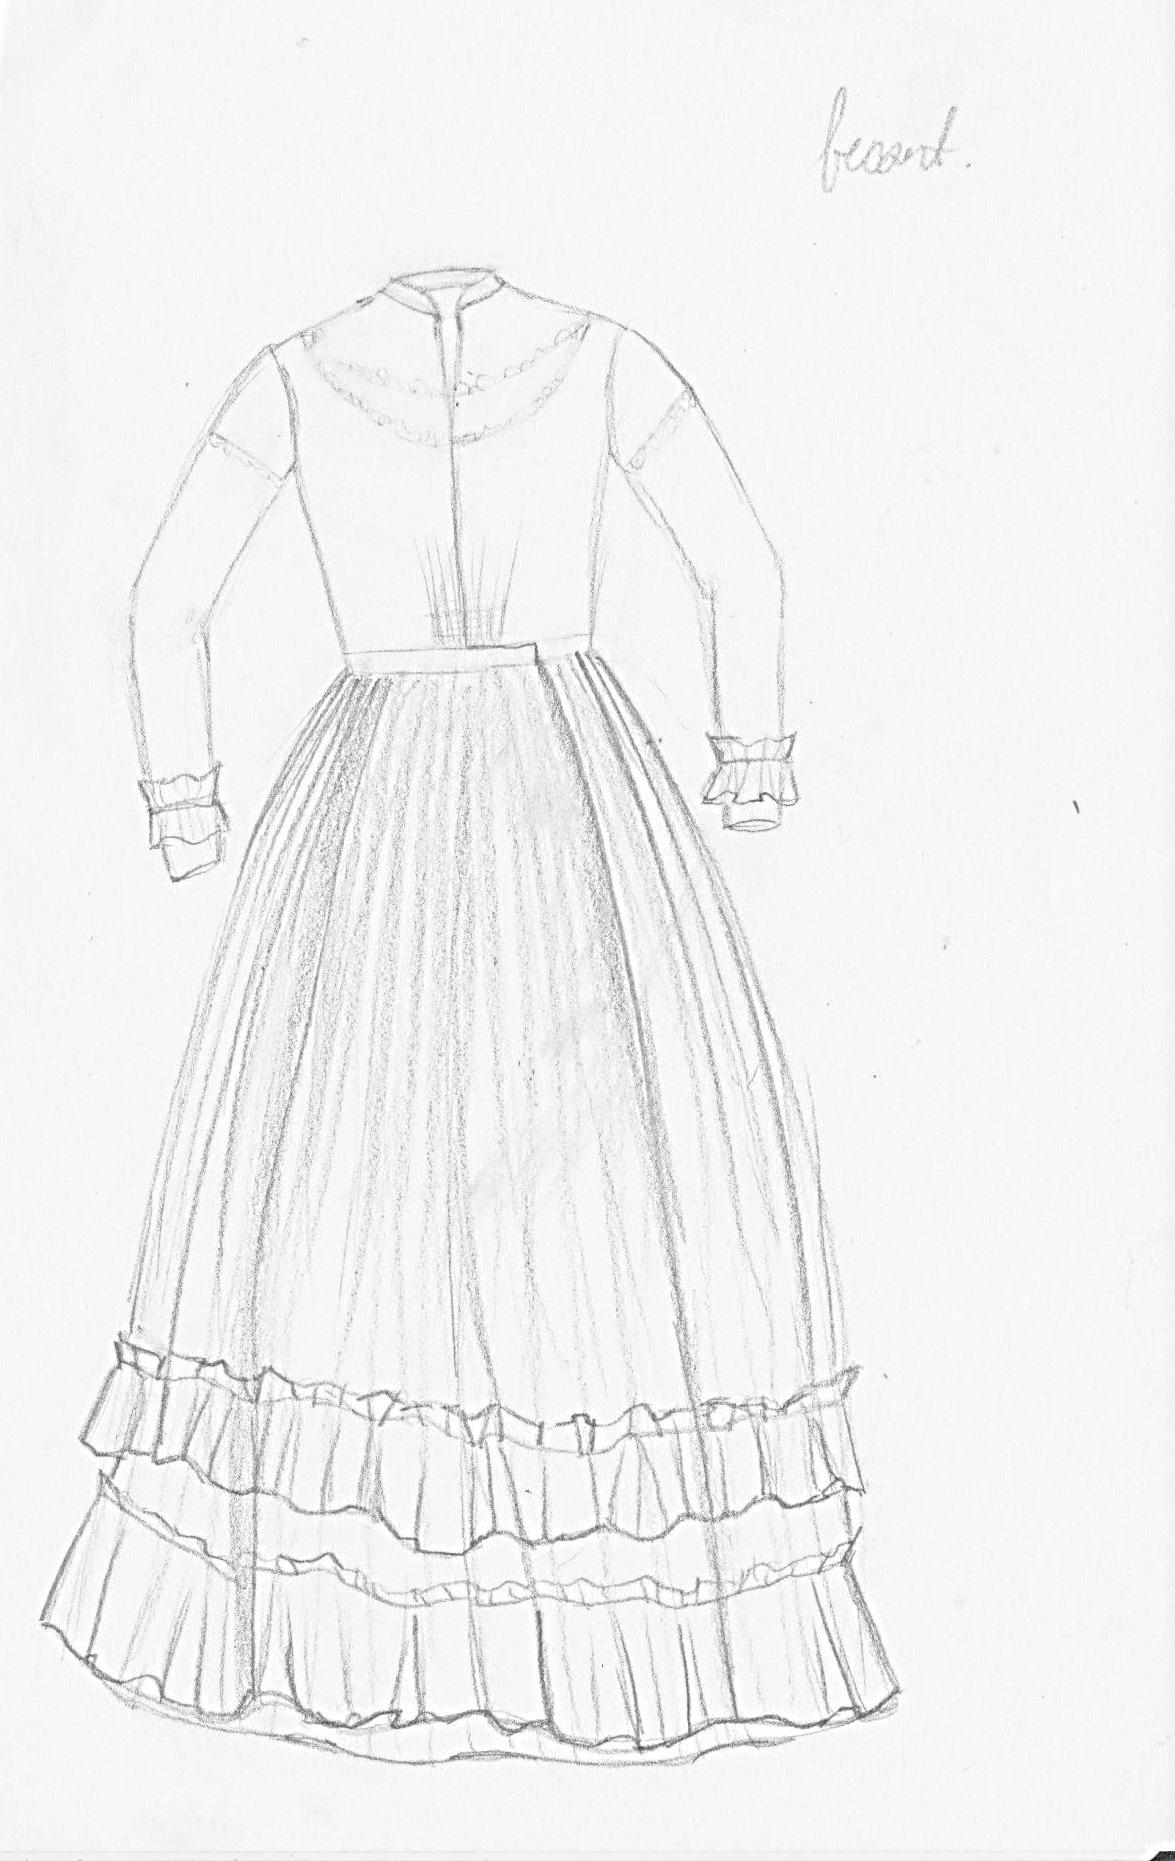 1175x1861 Alys Mak Pilsworth Ryerson Fashion Research Collection